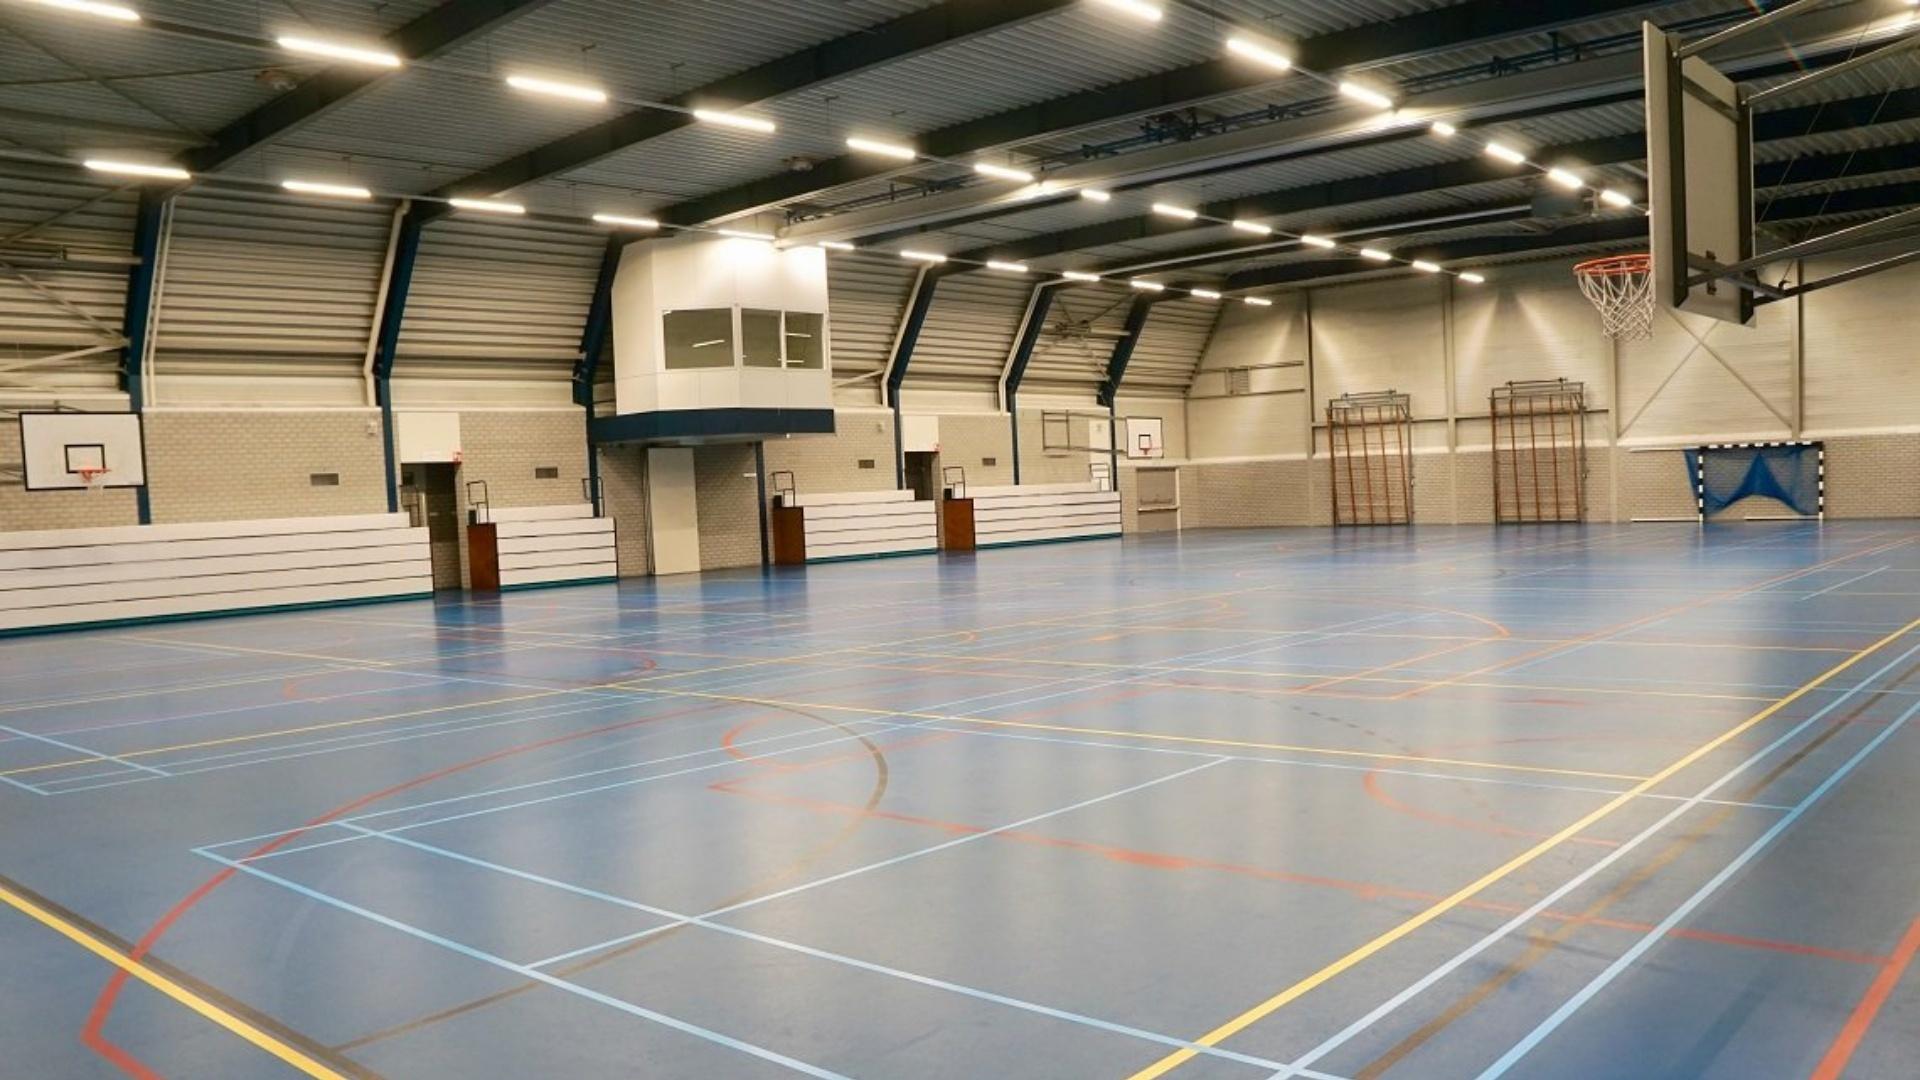 sporthal-het-heem-dsc07867-b-brosi-p1140.jpg